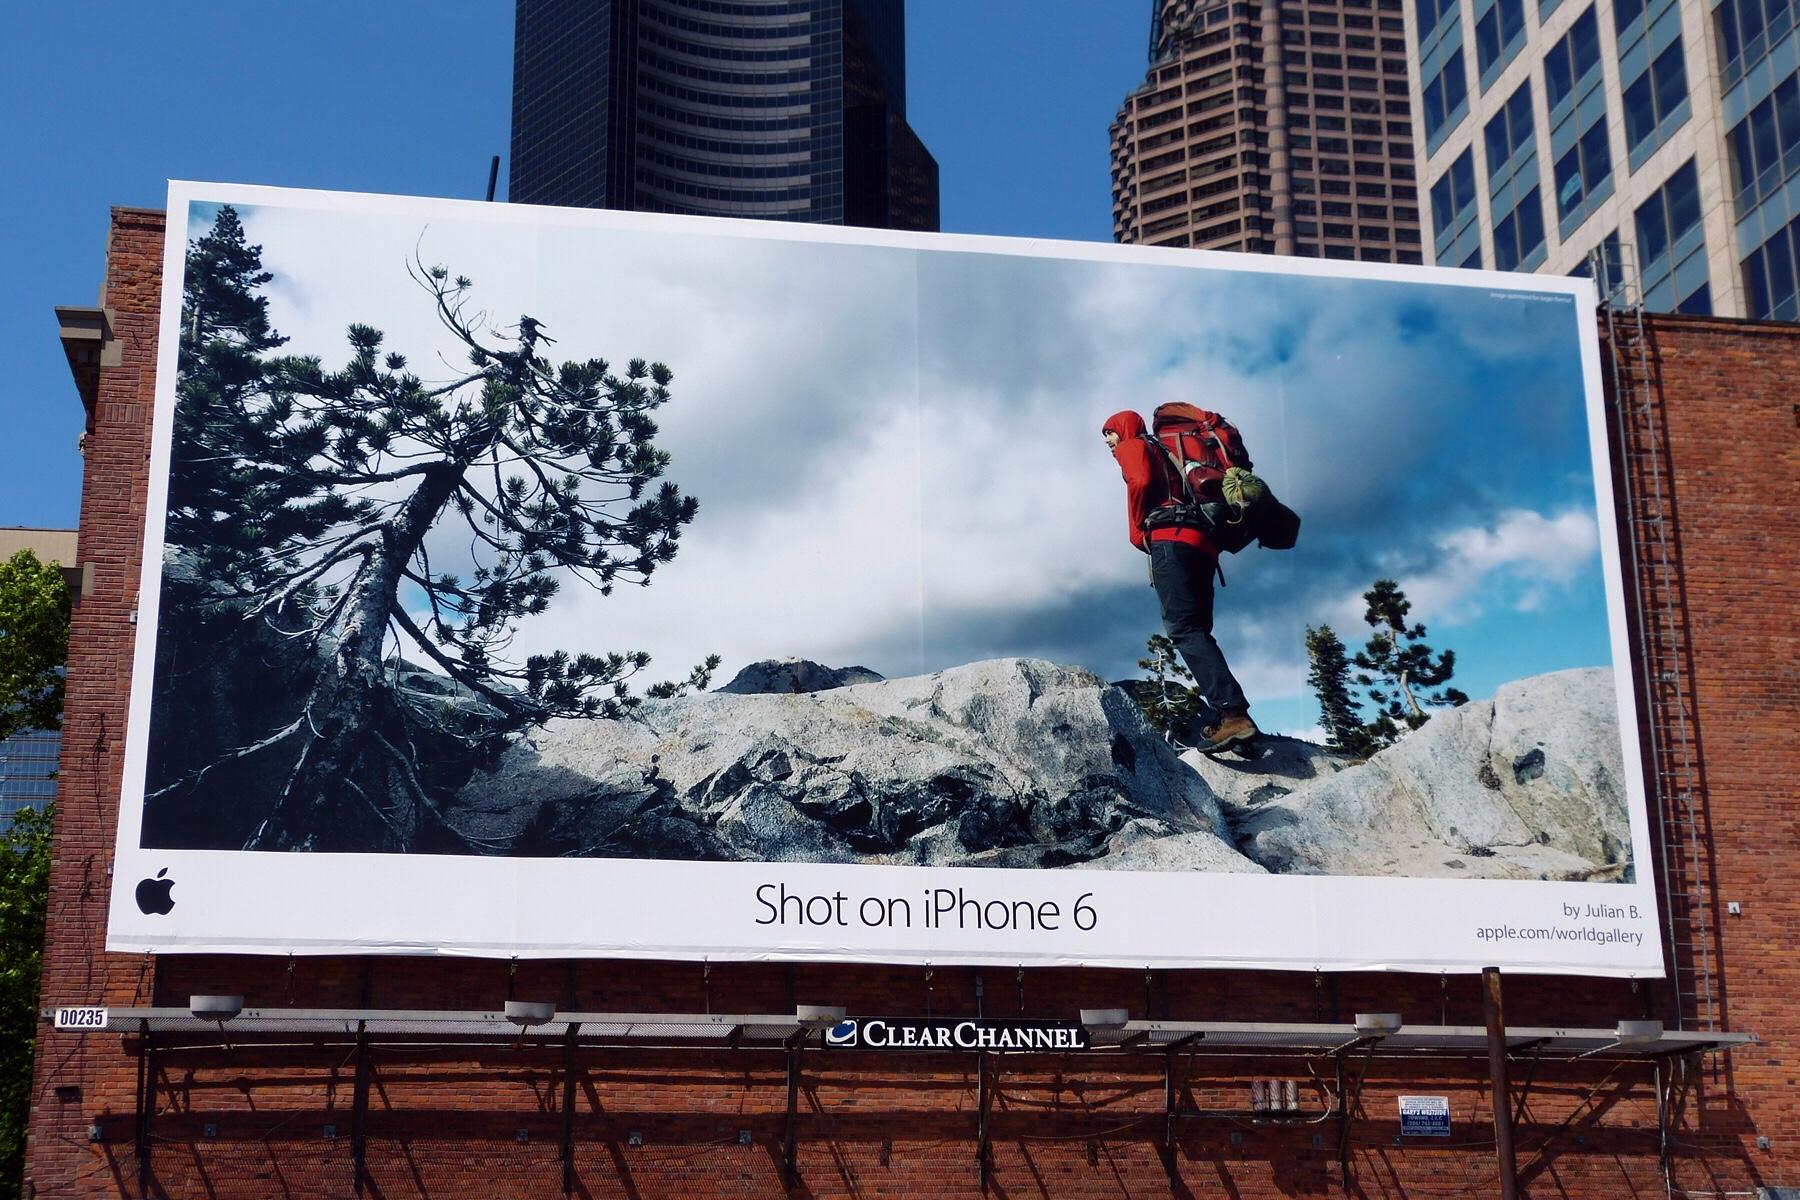 iPhone XS 因为前镜头的「美颜」功能,被大量用户吐槽